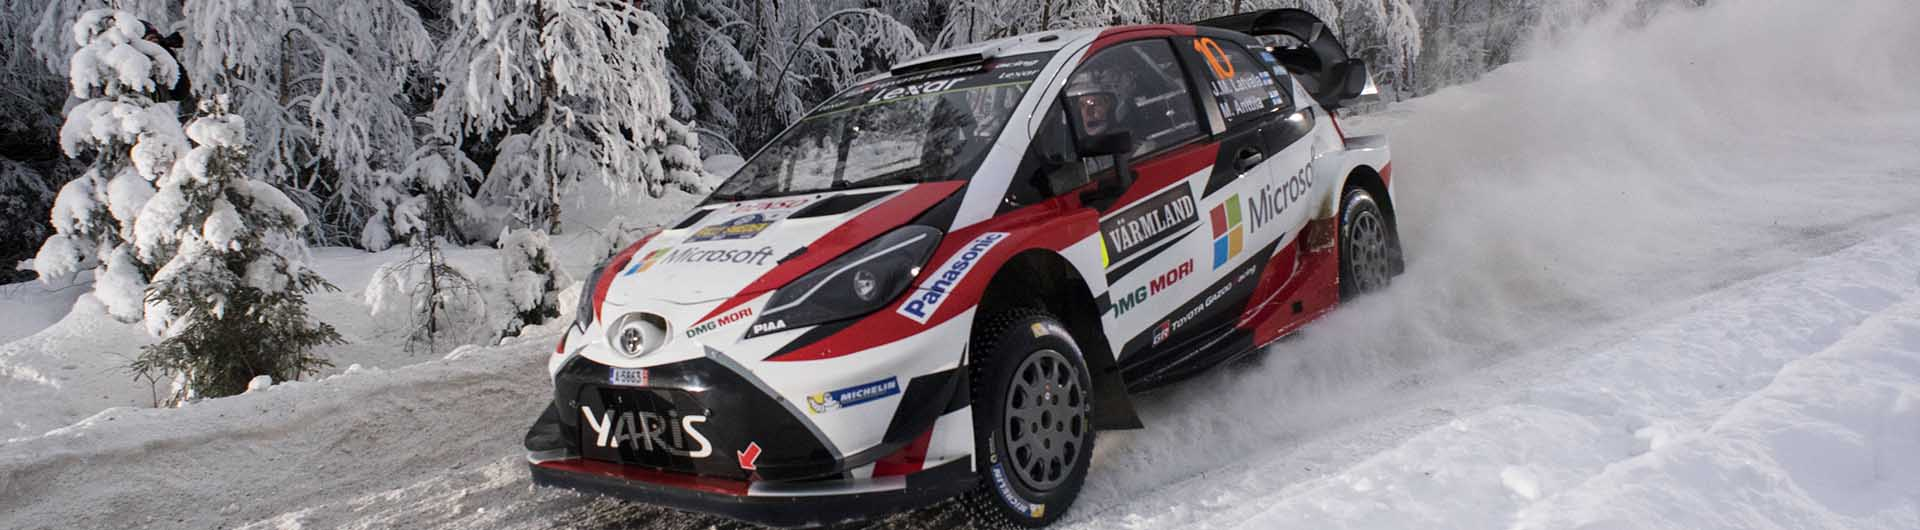 Thierry Neuville Rally da Suécia